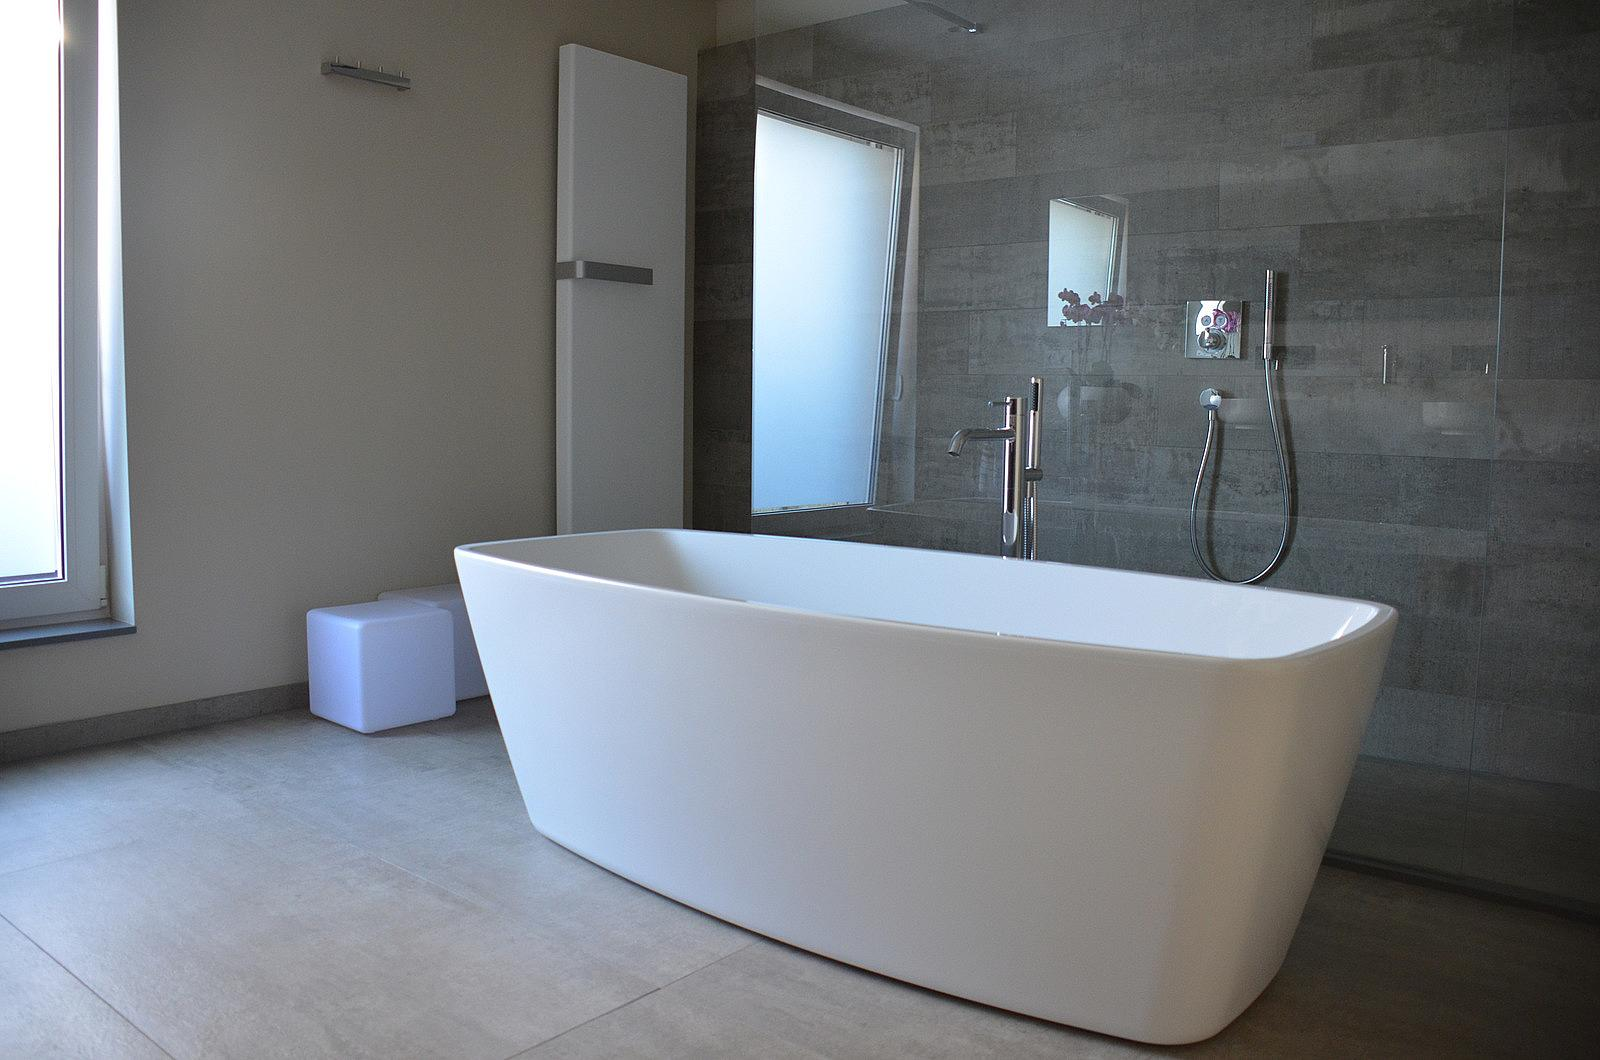 Bruyndoncx sanitair